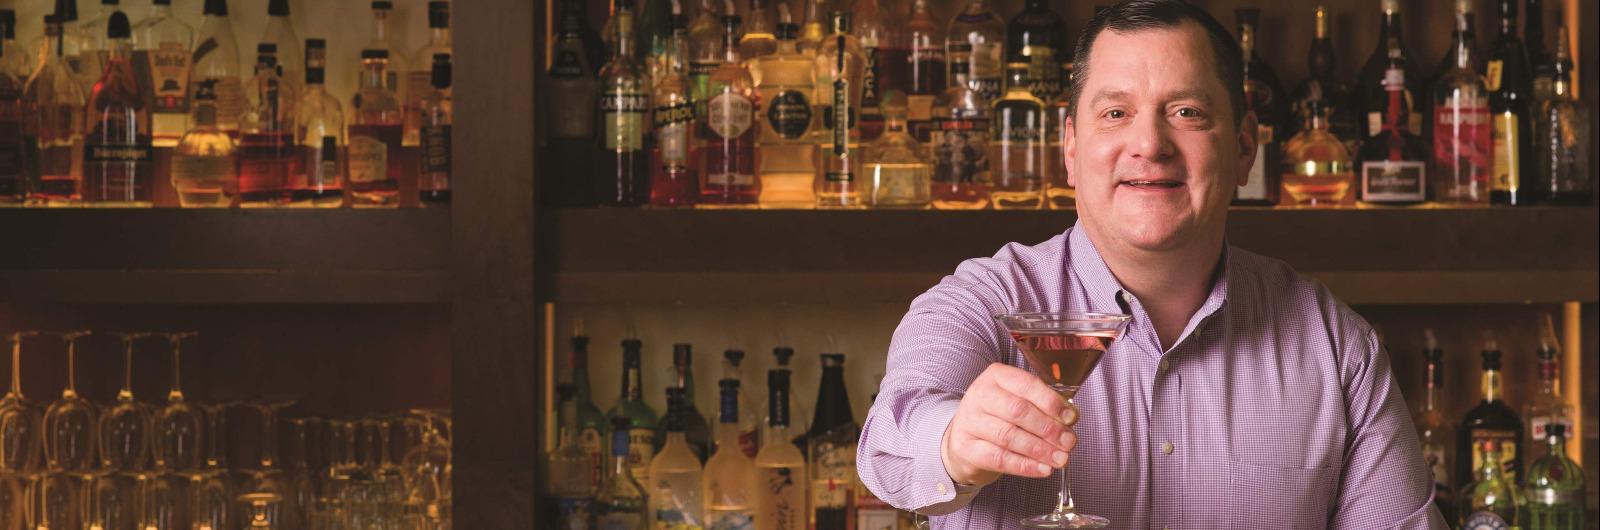 About TAMO Bistro + Bar at Massachusetts